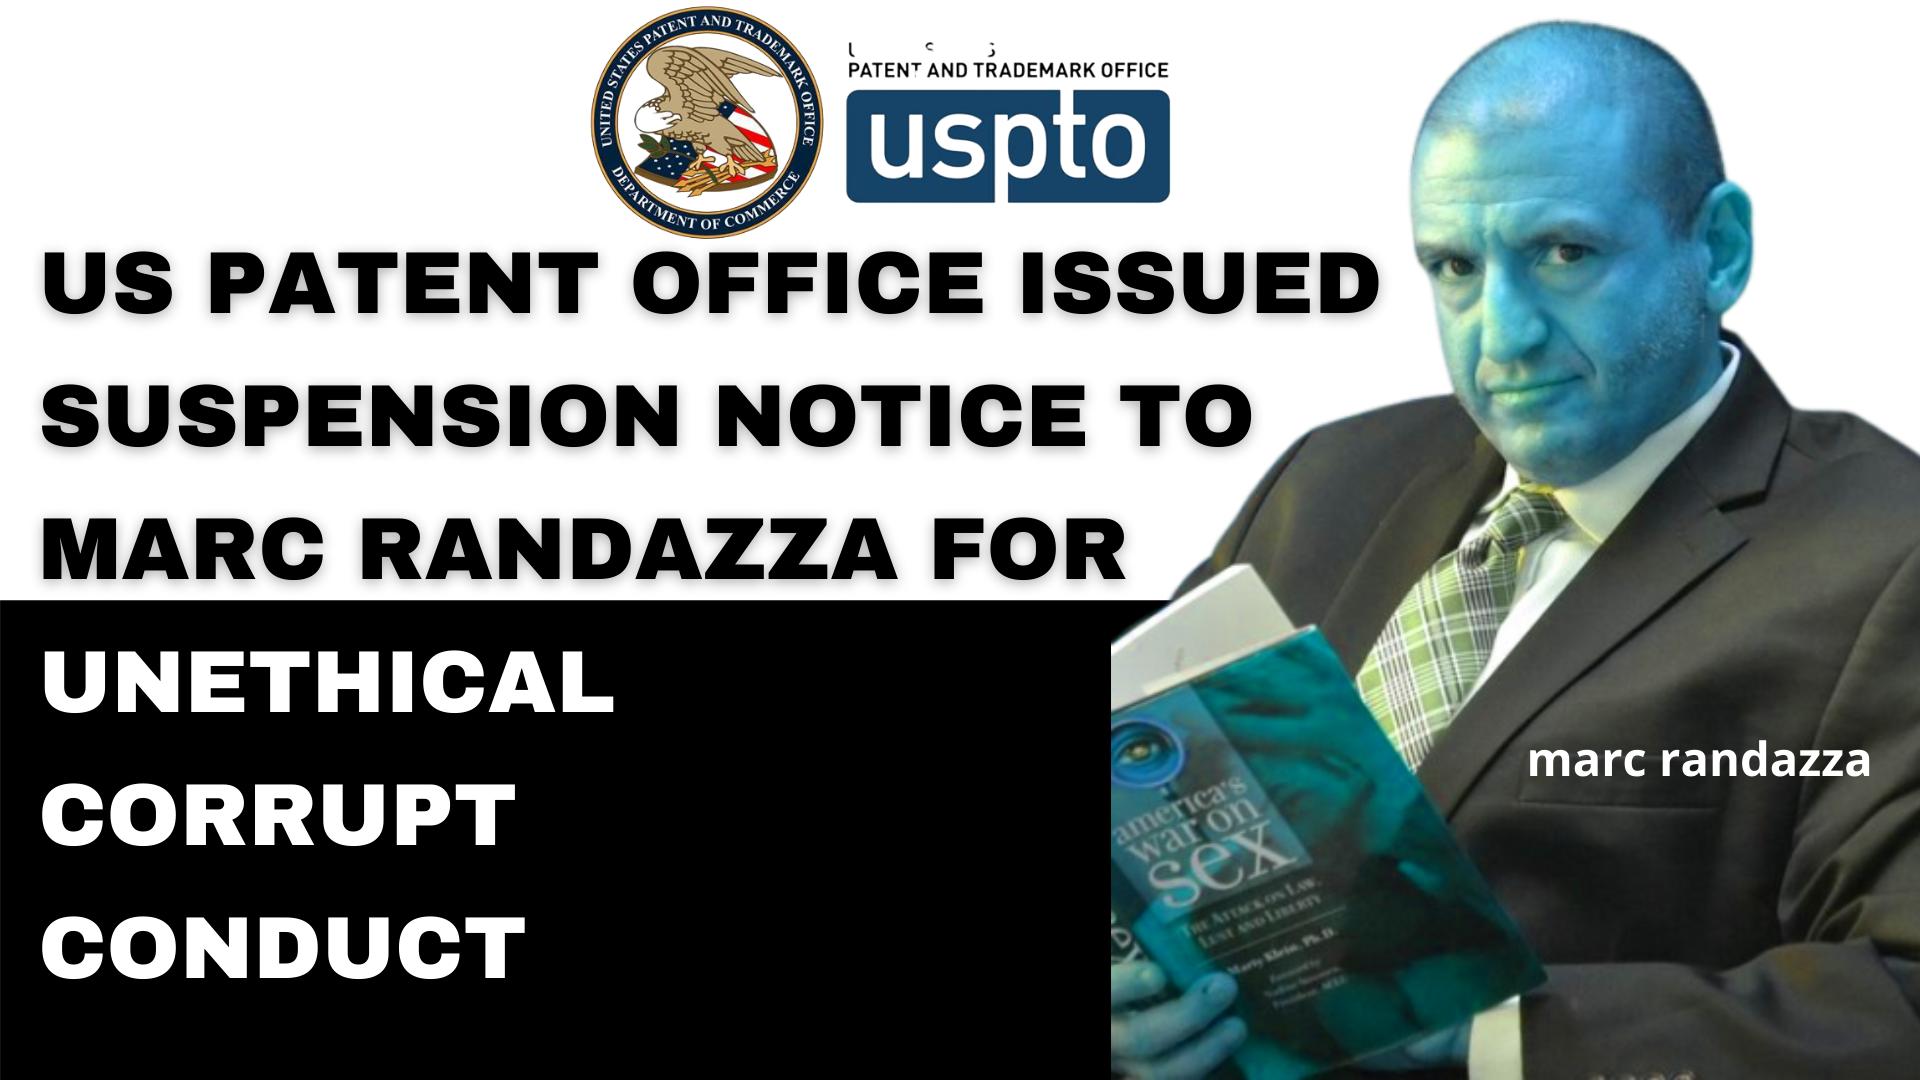 US PATENT OFFICE SUSPENDED CORRUPT ATTORNEY MARC RANDAZZA